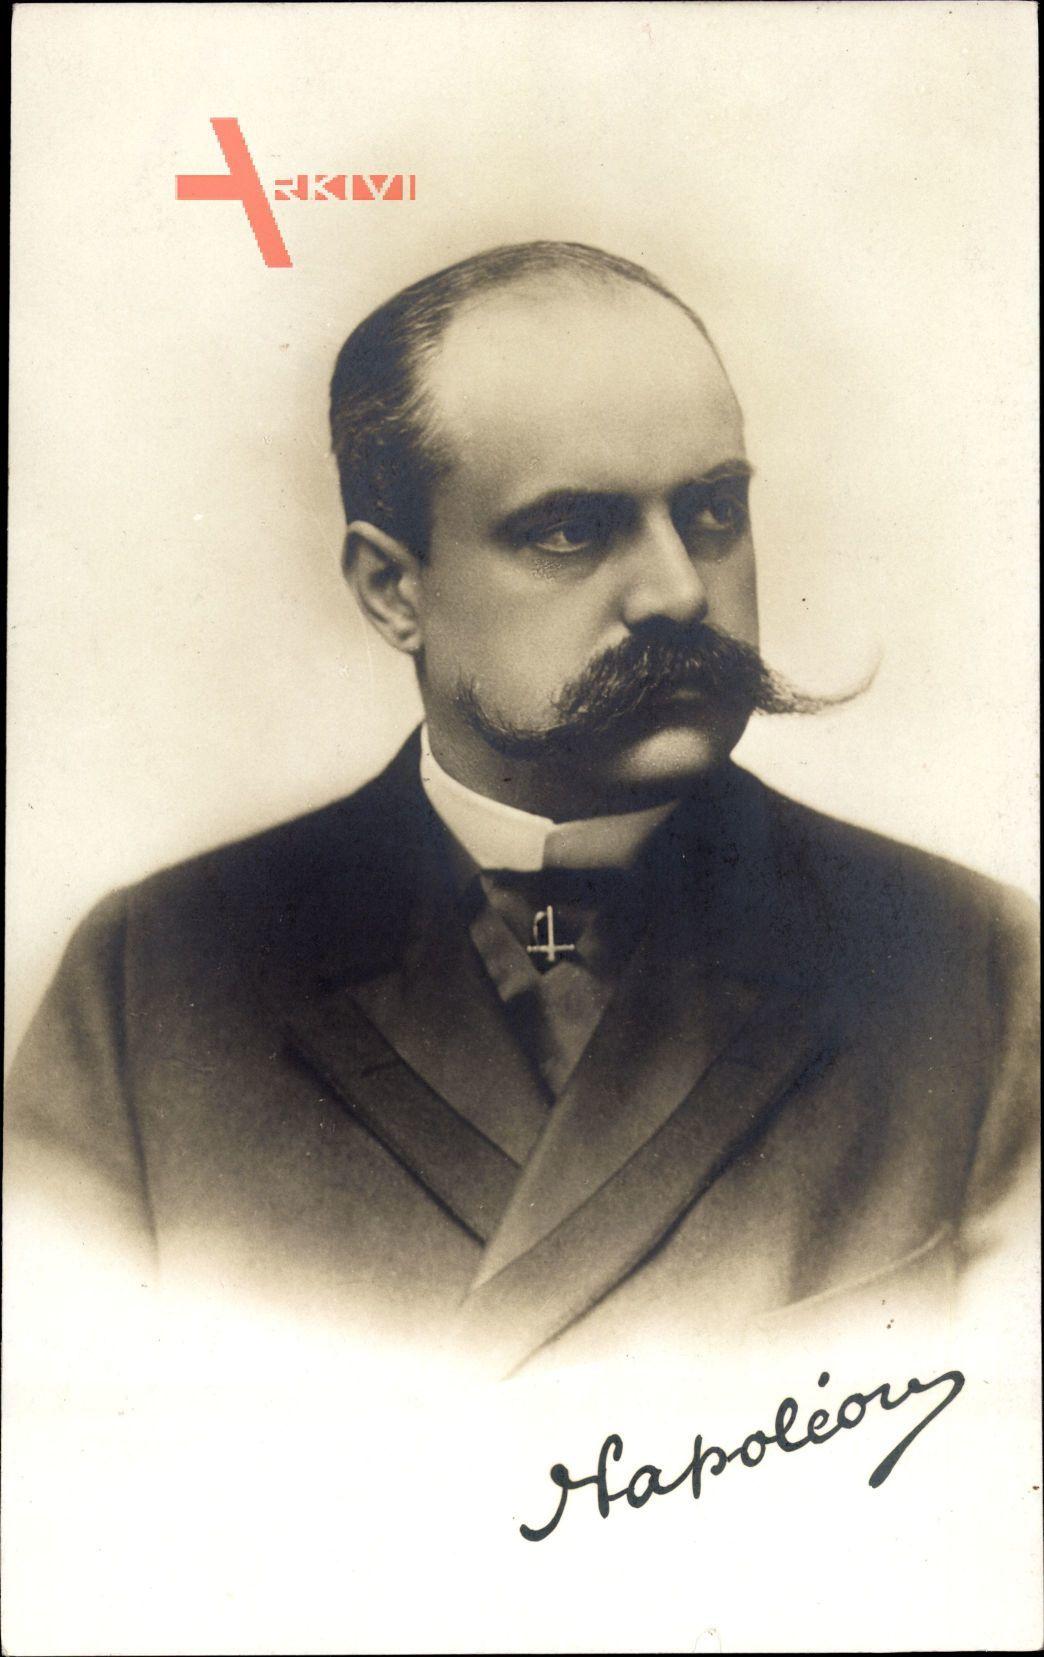 Prince Victor Napoléon, 1862 à 1926, fils de Napoléon Jérôme Bonaparte